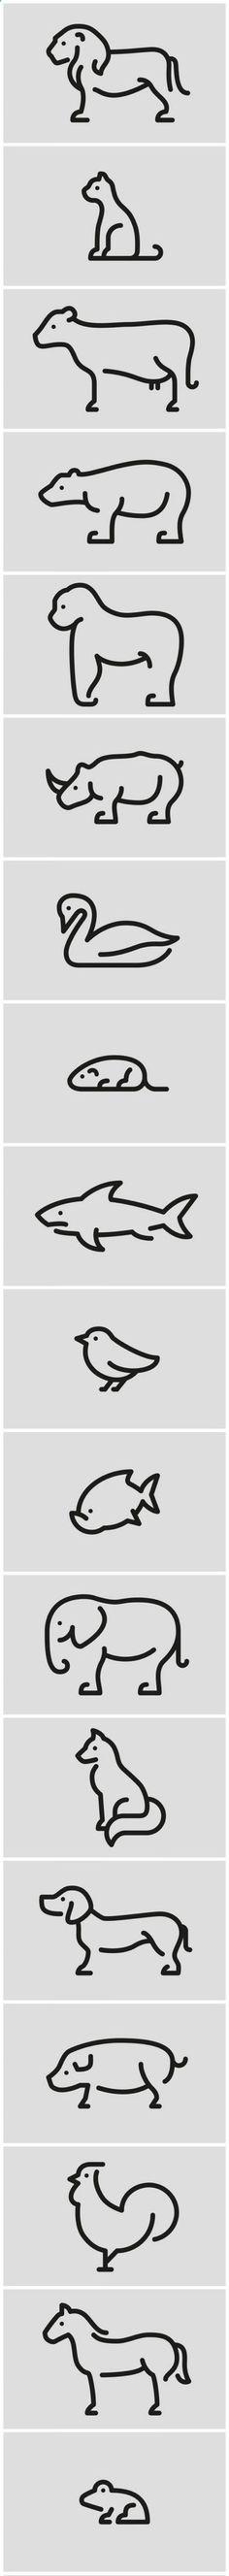 Simple Animals